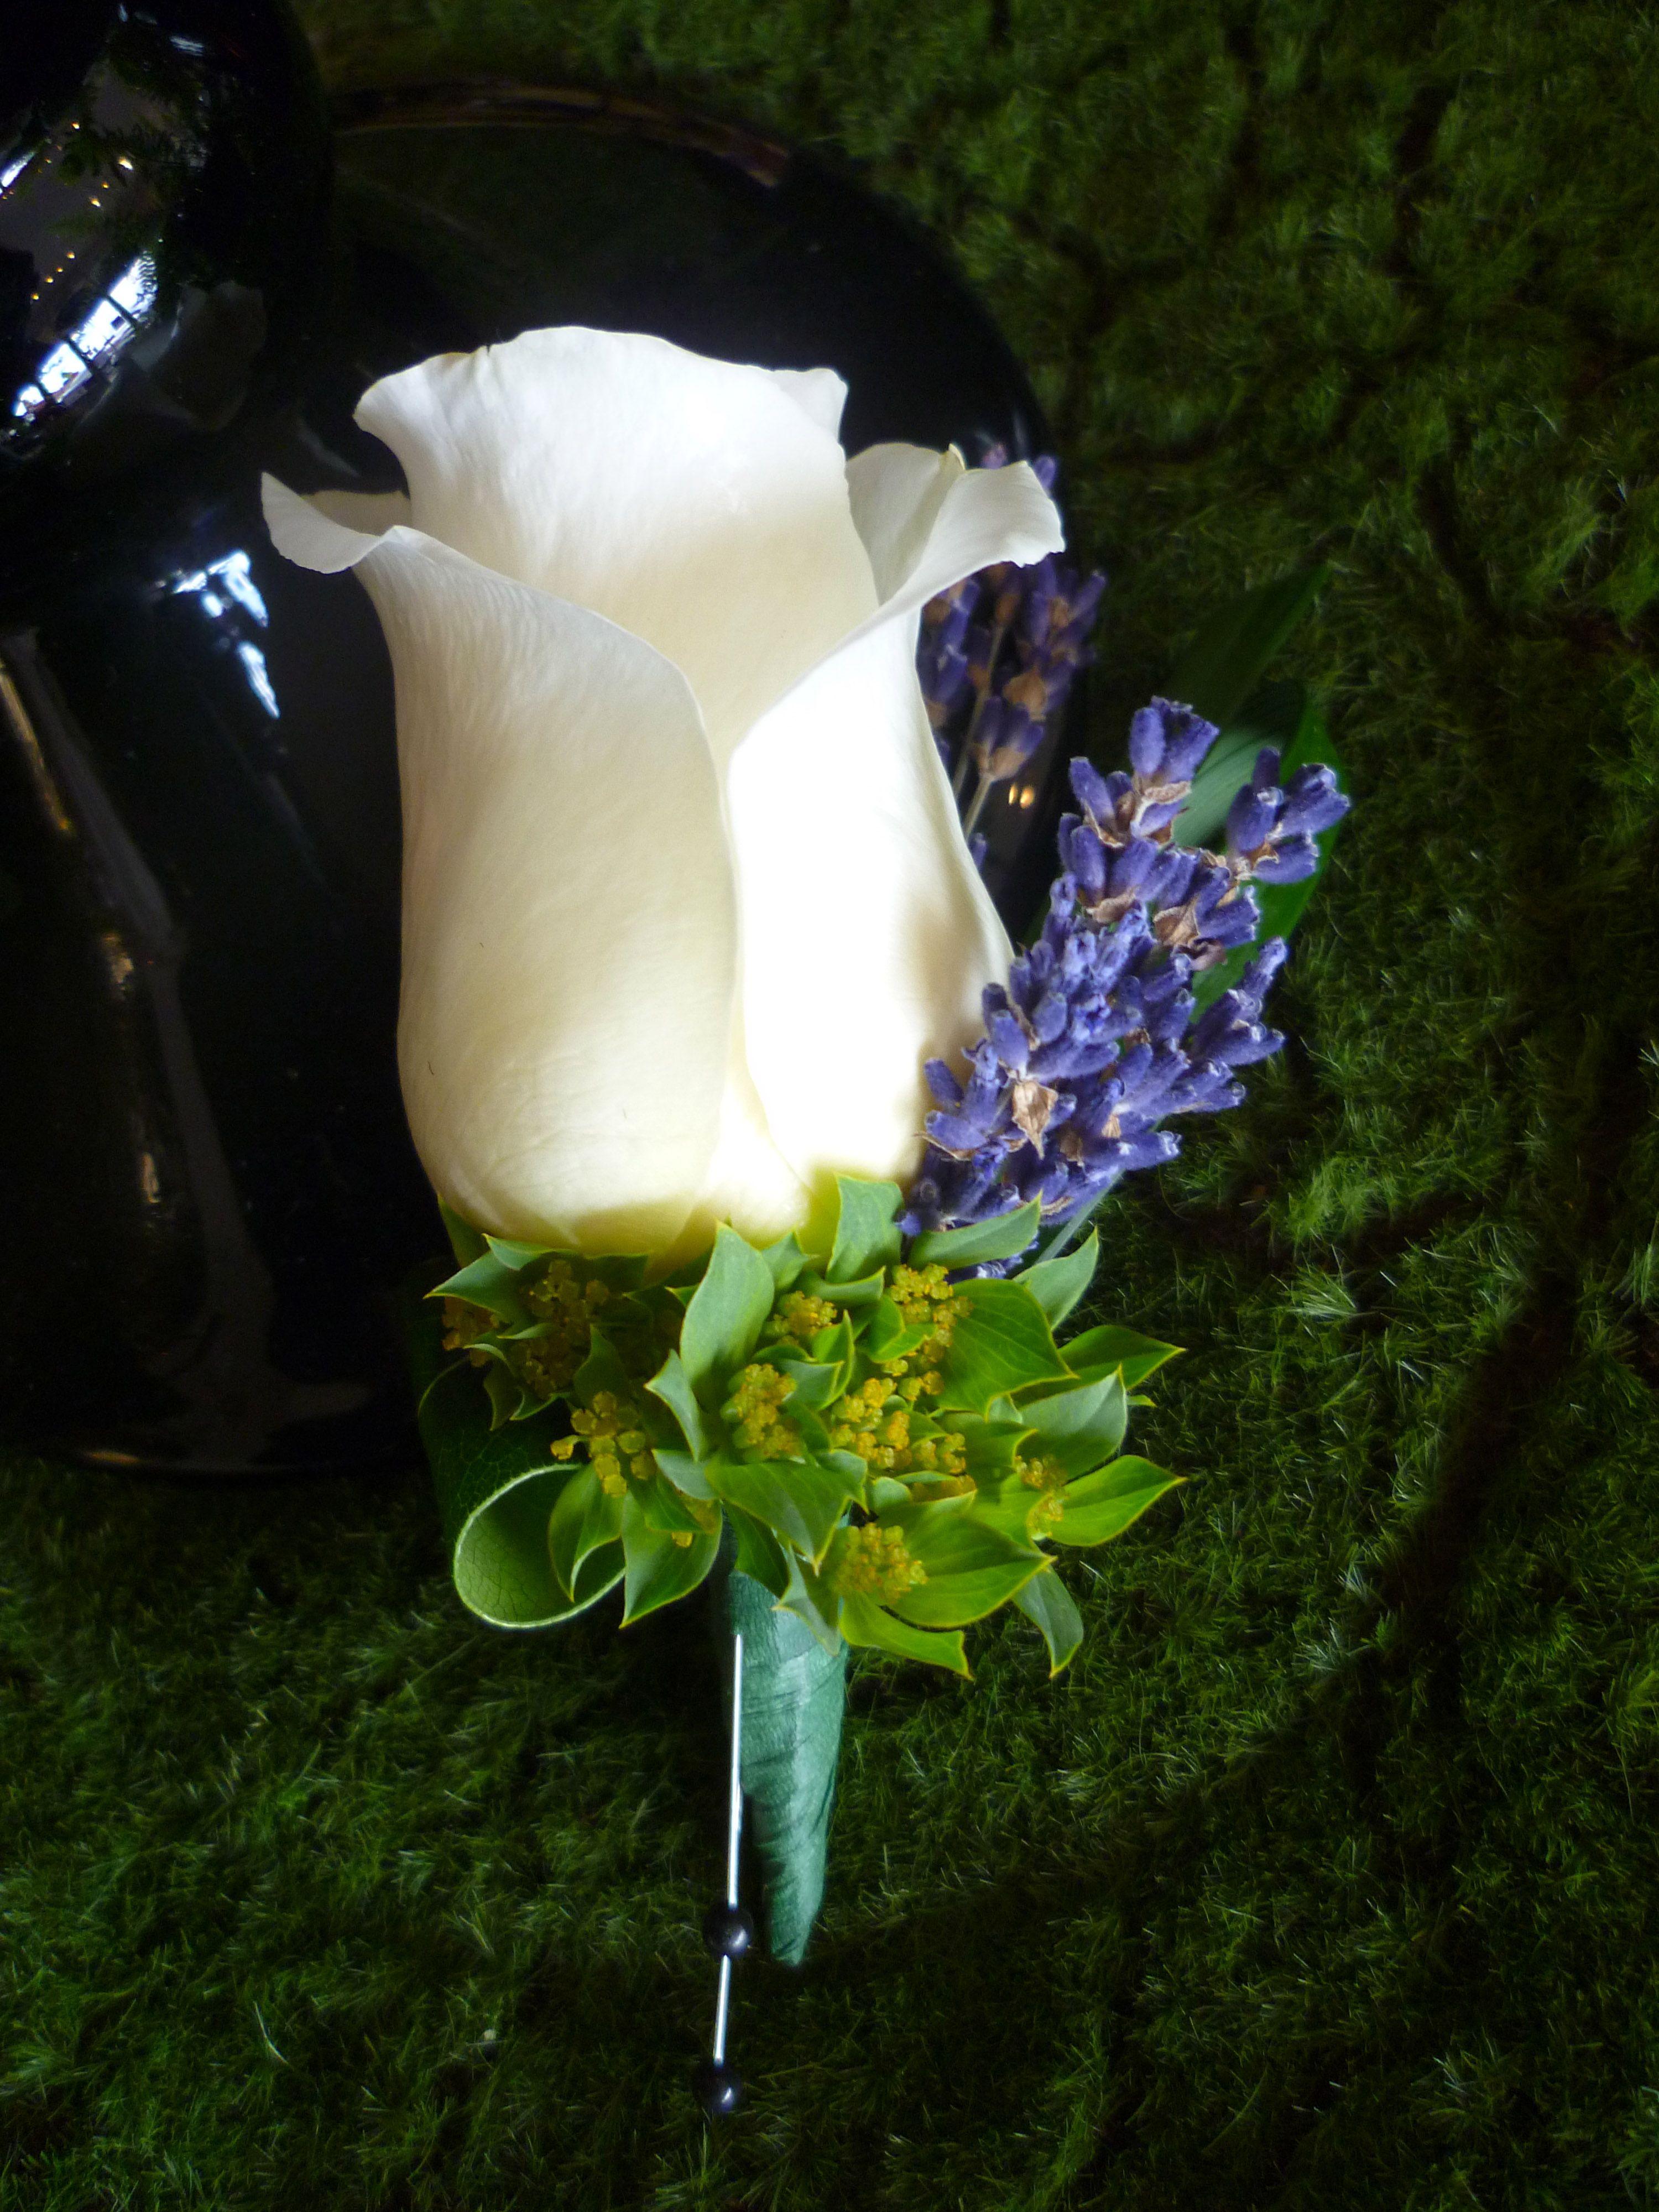 White rose and lavendar boutonniere